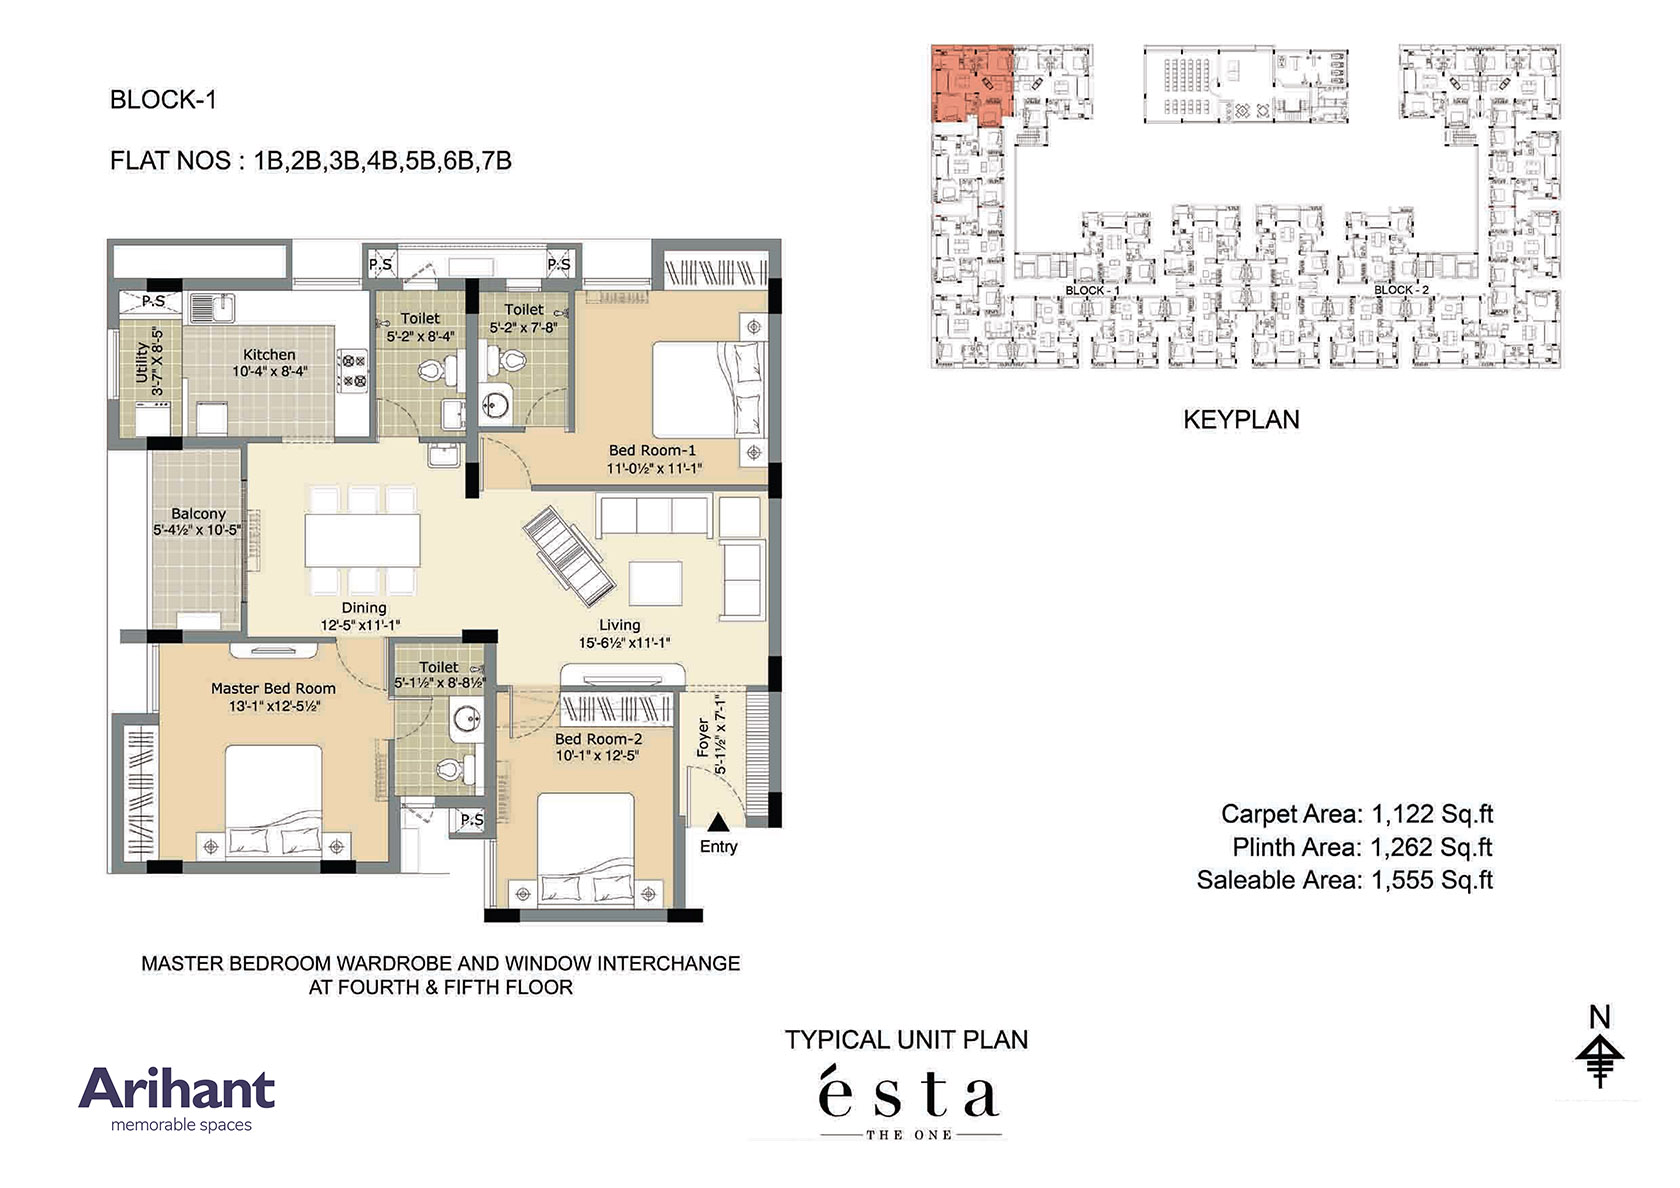 Arihant - Esta_Typical Unit Plan - Block 1 - Type B